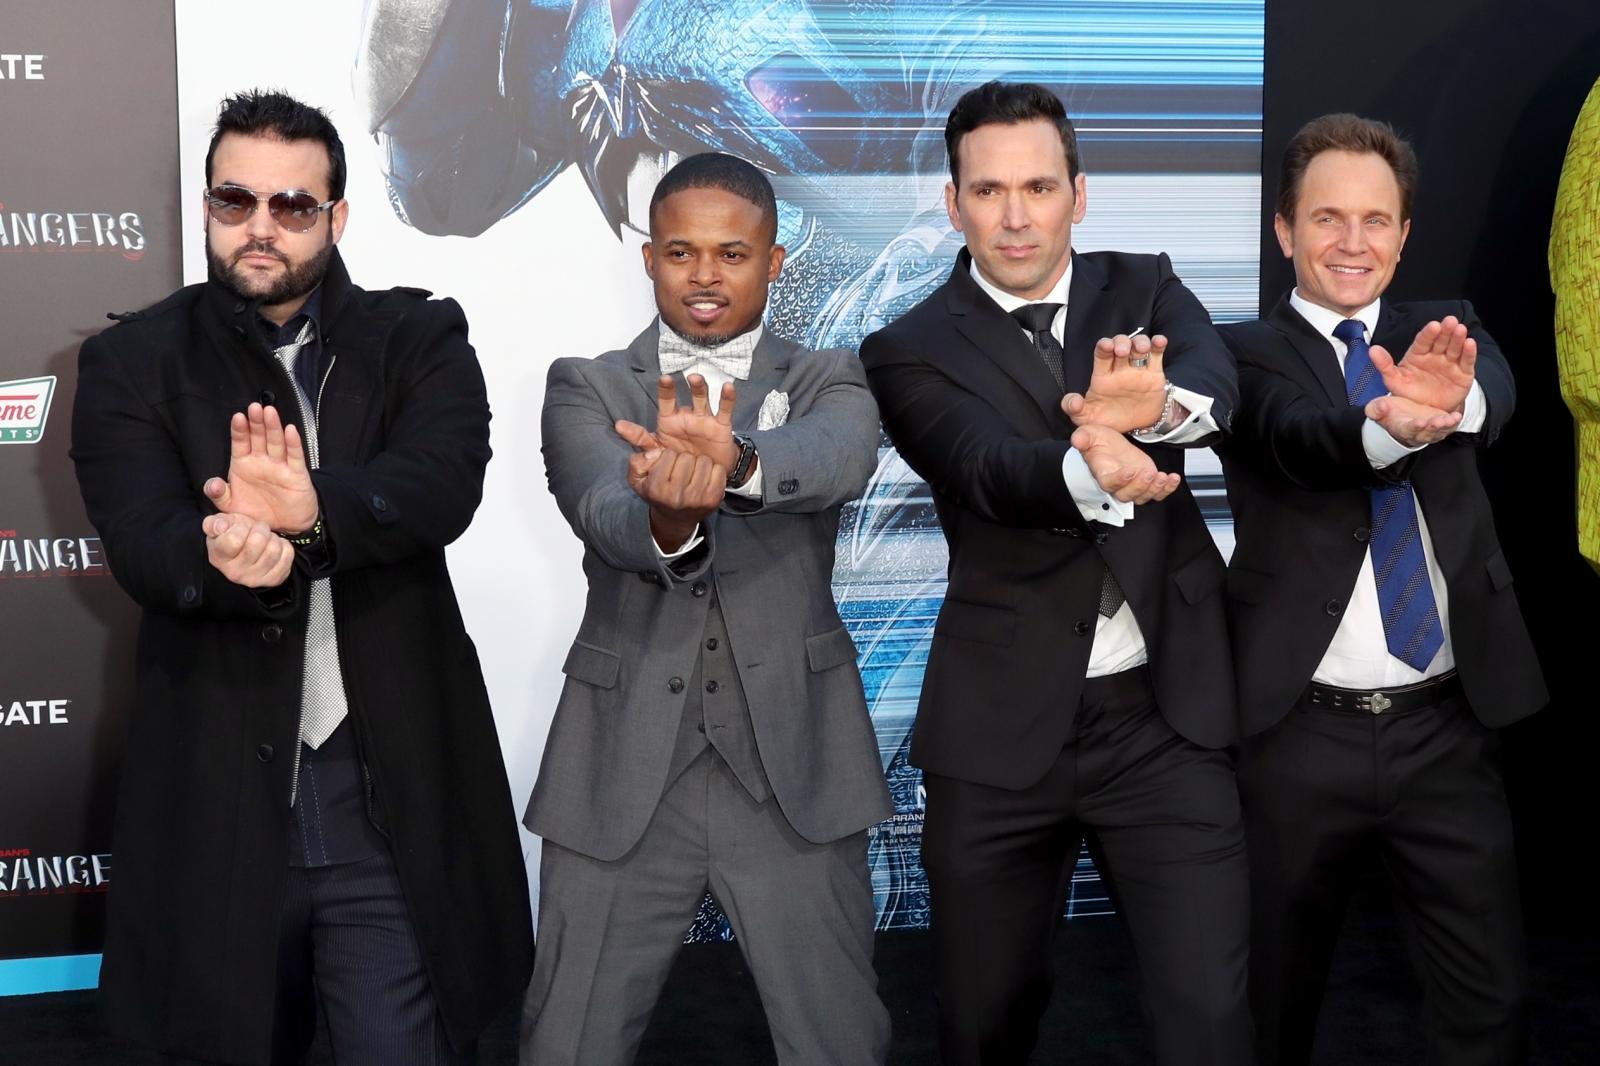 Original Mighty Morphin Power Rangers reunion